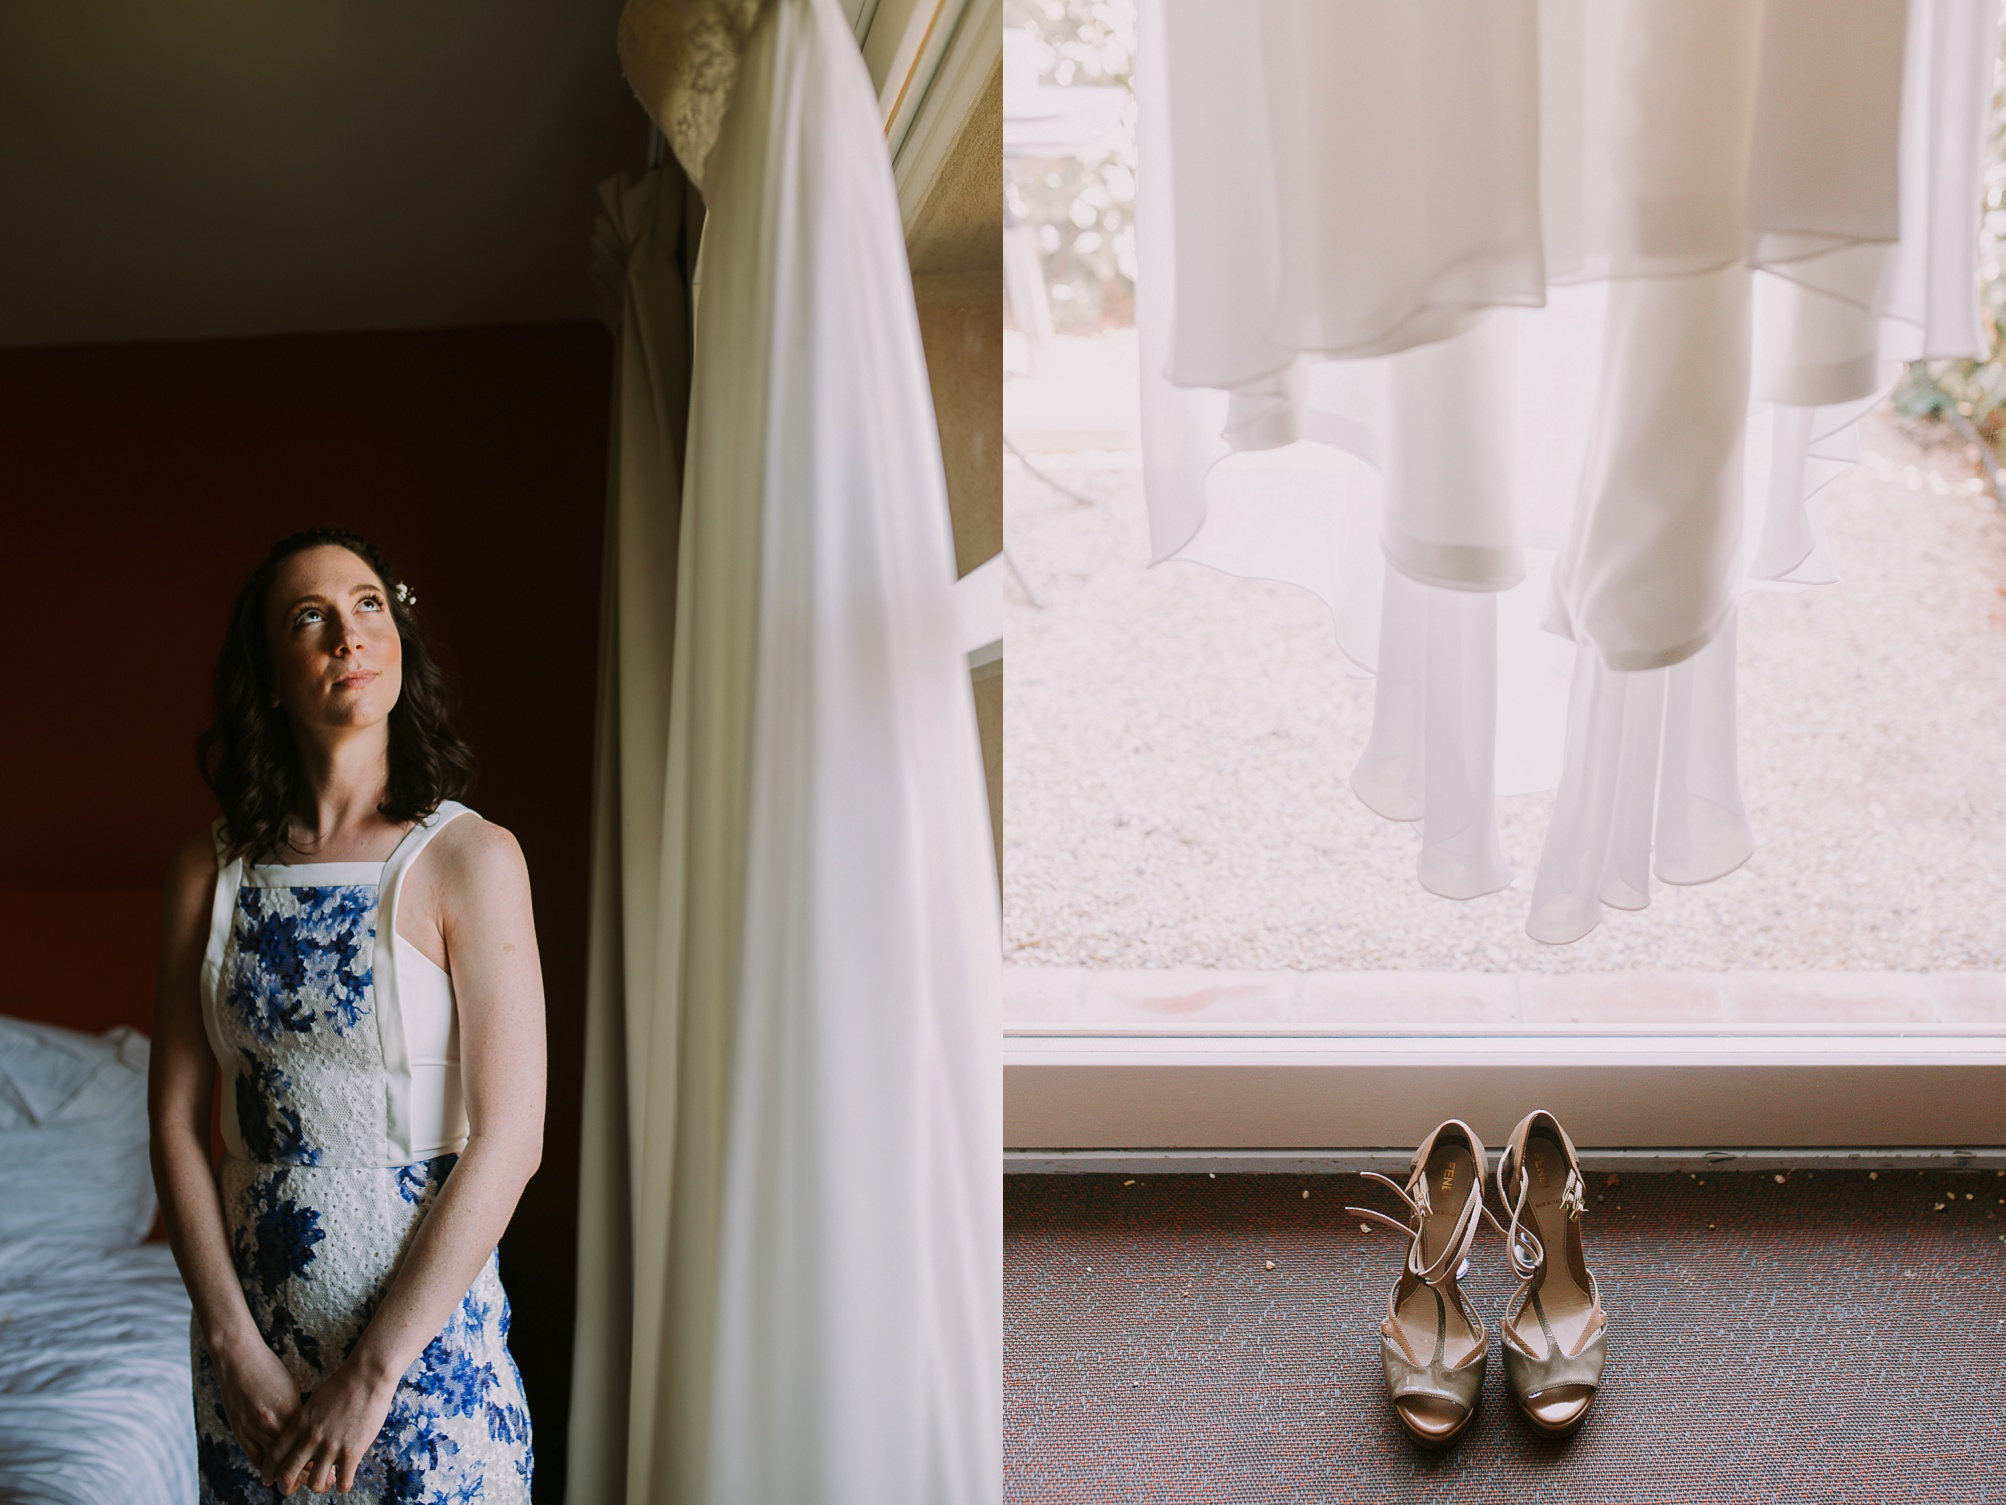 katerynaphotos-mariage-photographe-puyloubier-provence-aix-en-provence-sud-de-la-france_0336.jpg